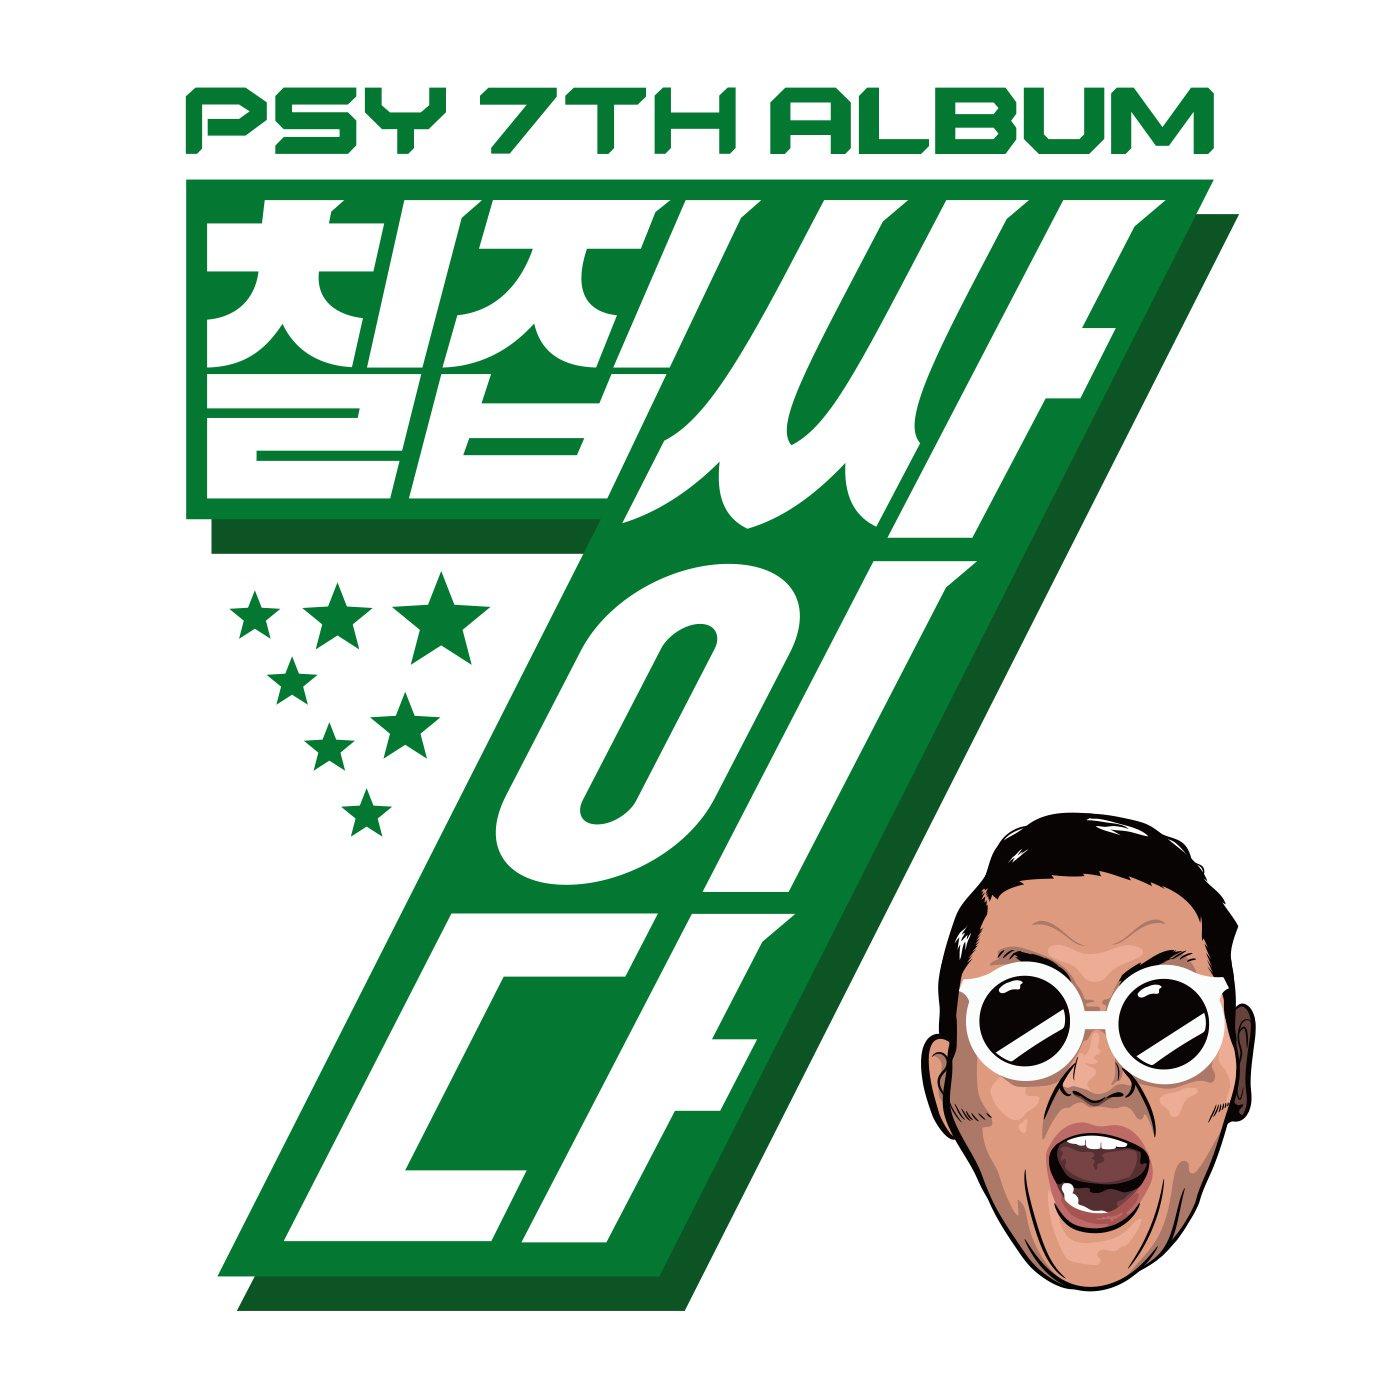 PSY album 칠집싸이다